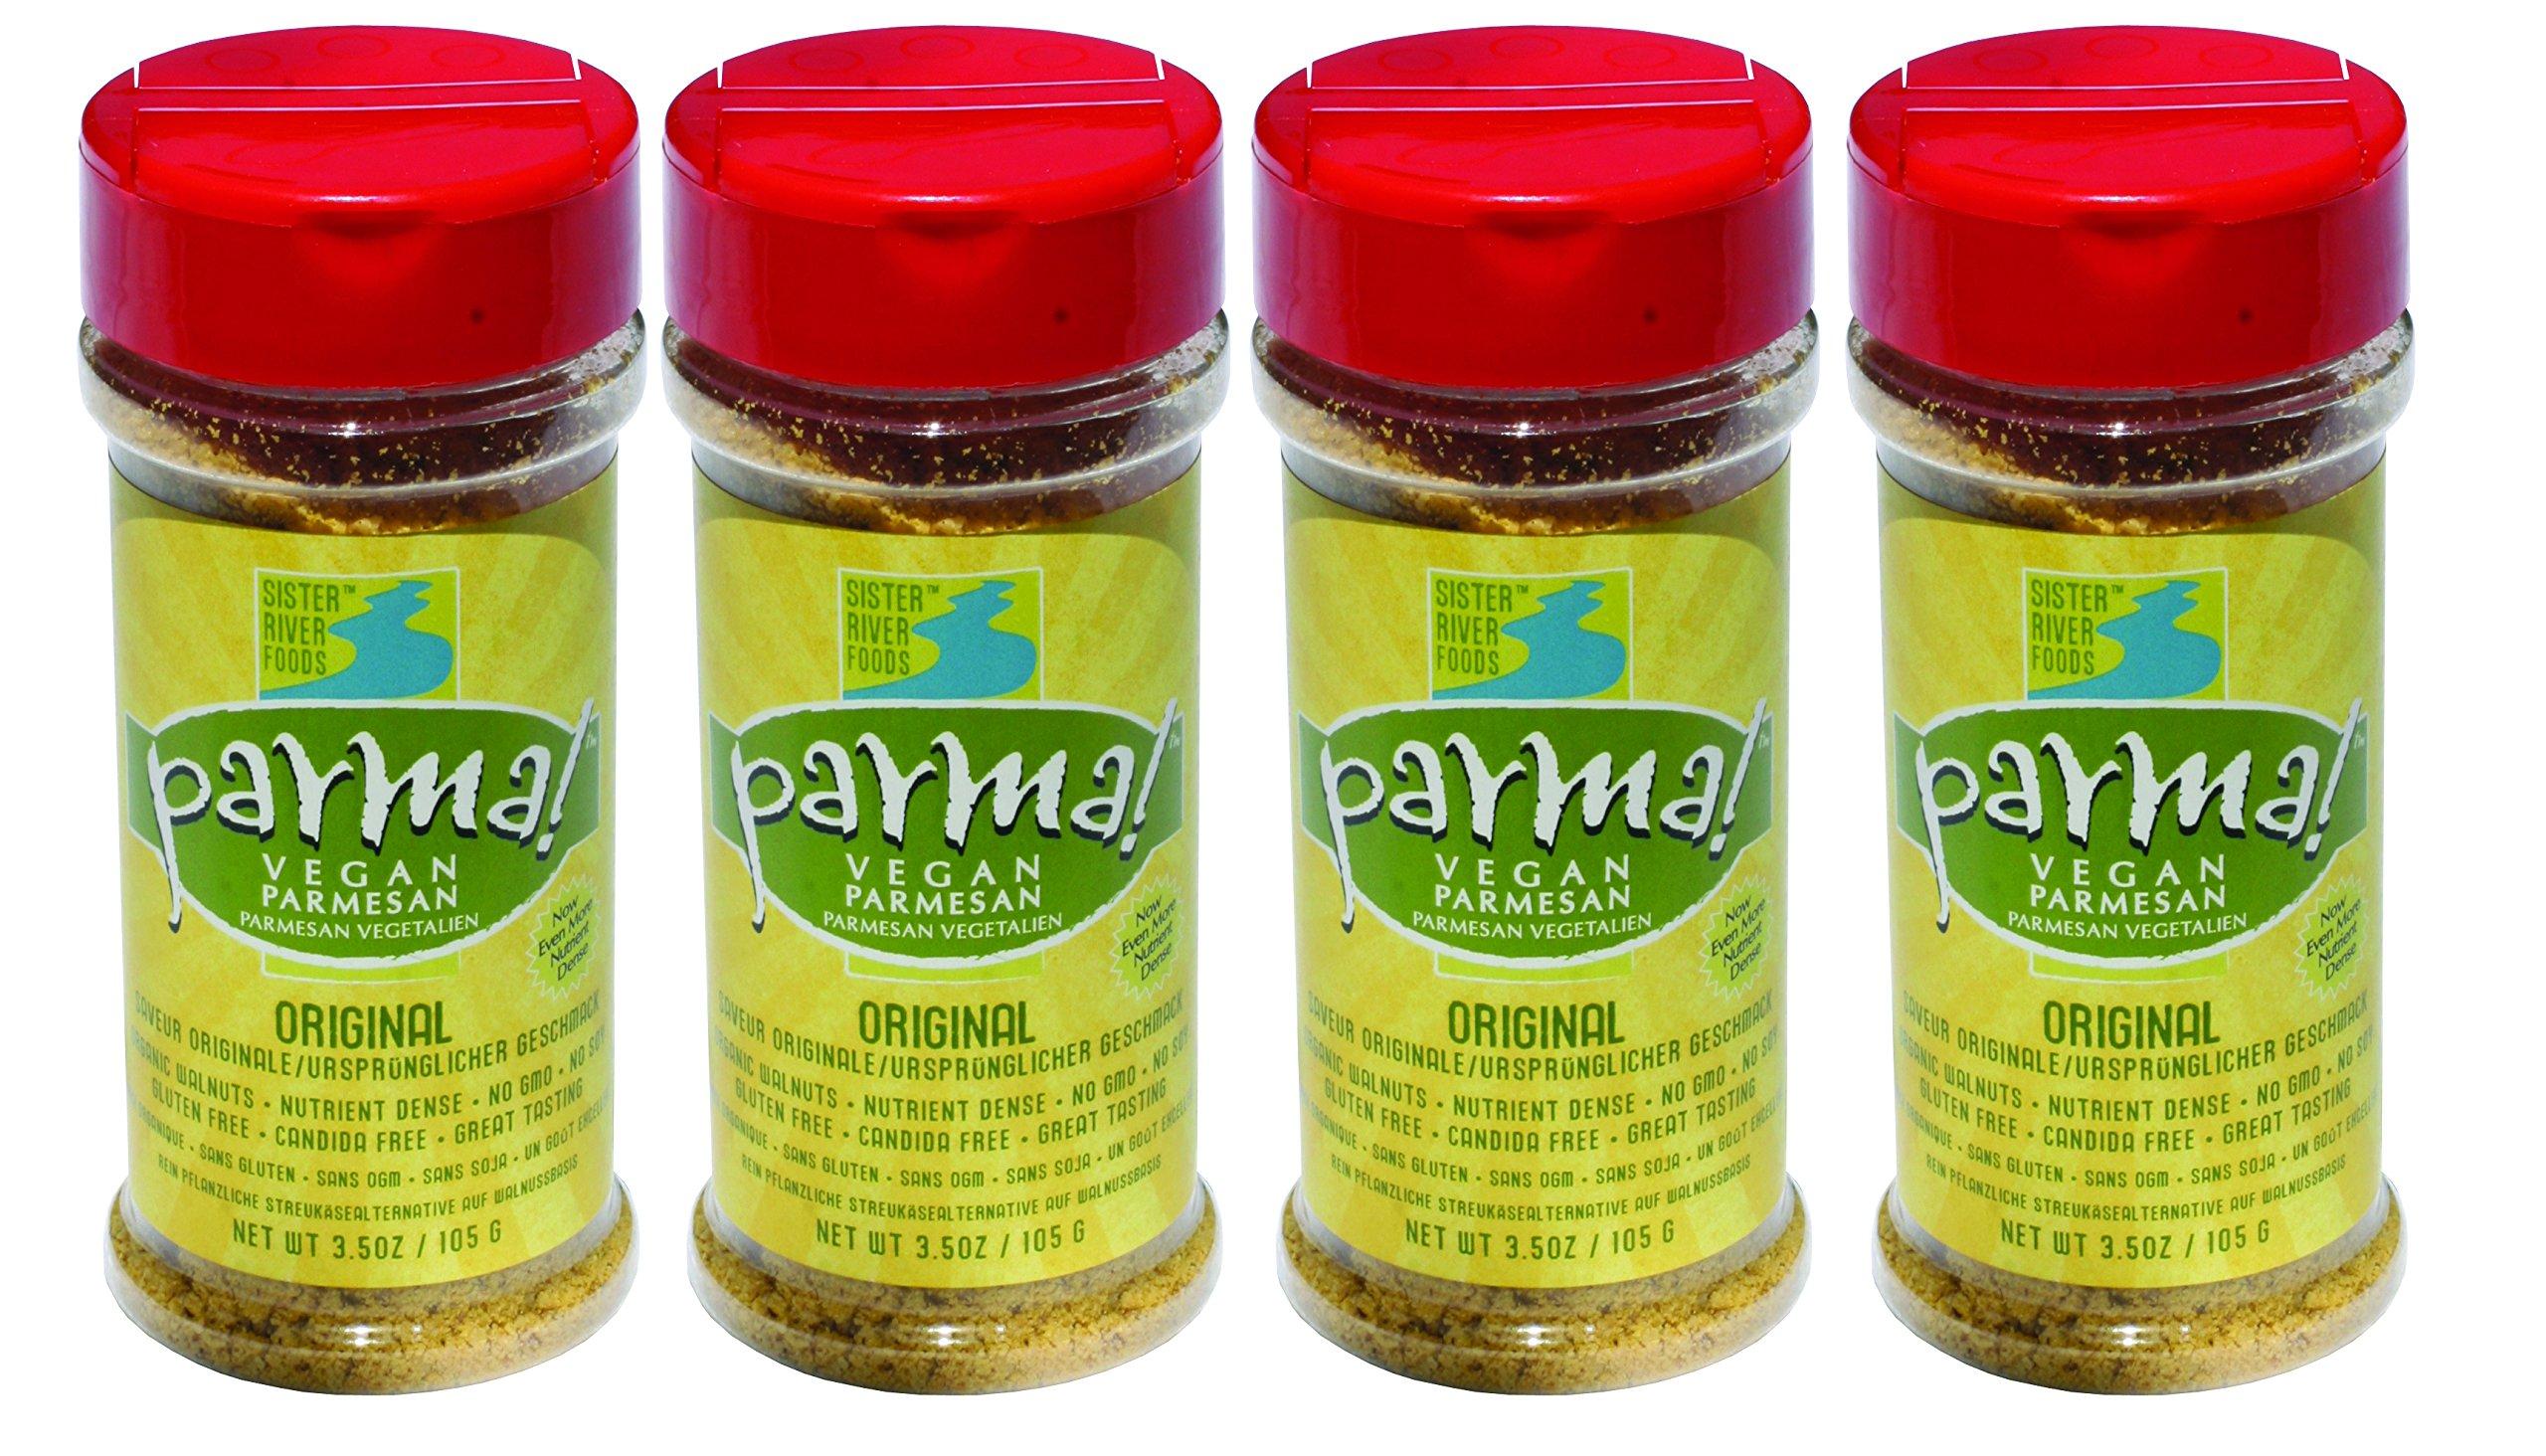 Parma! Vegan Parmesan Original by Parma